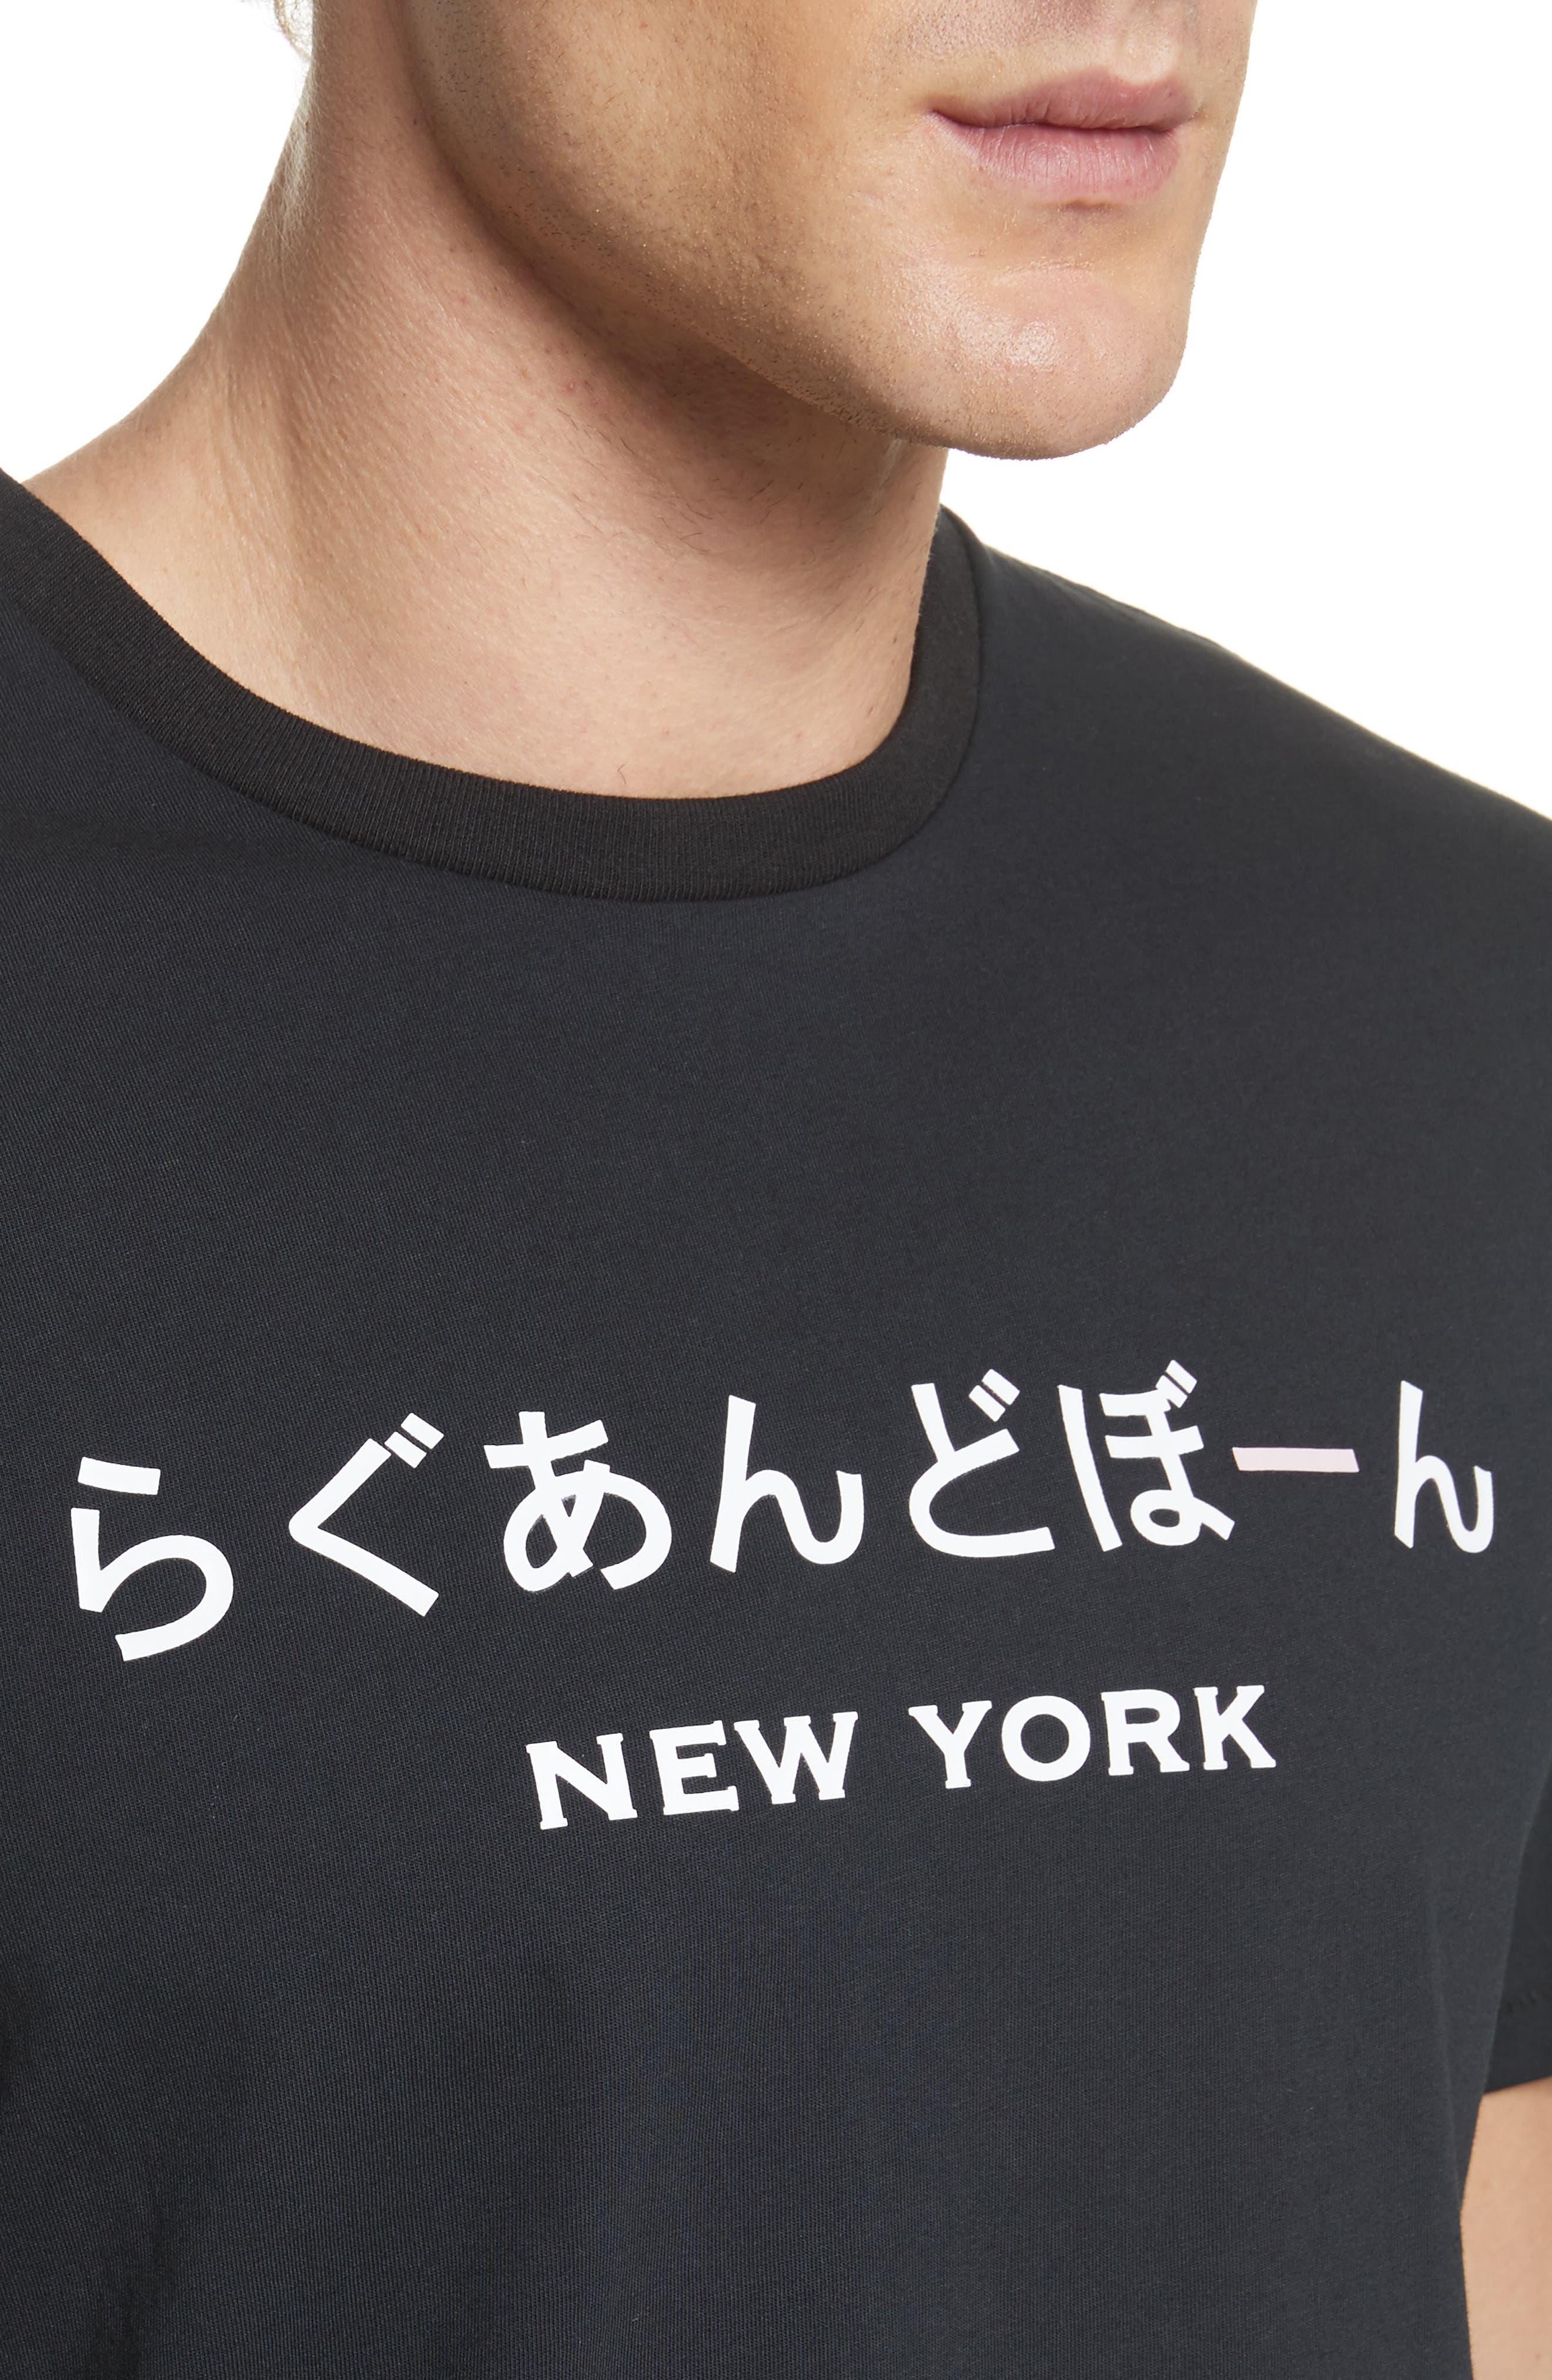 Japan Graphic T-Shirt,                             Alternate thumbnail 4, color,                             Black